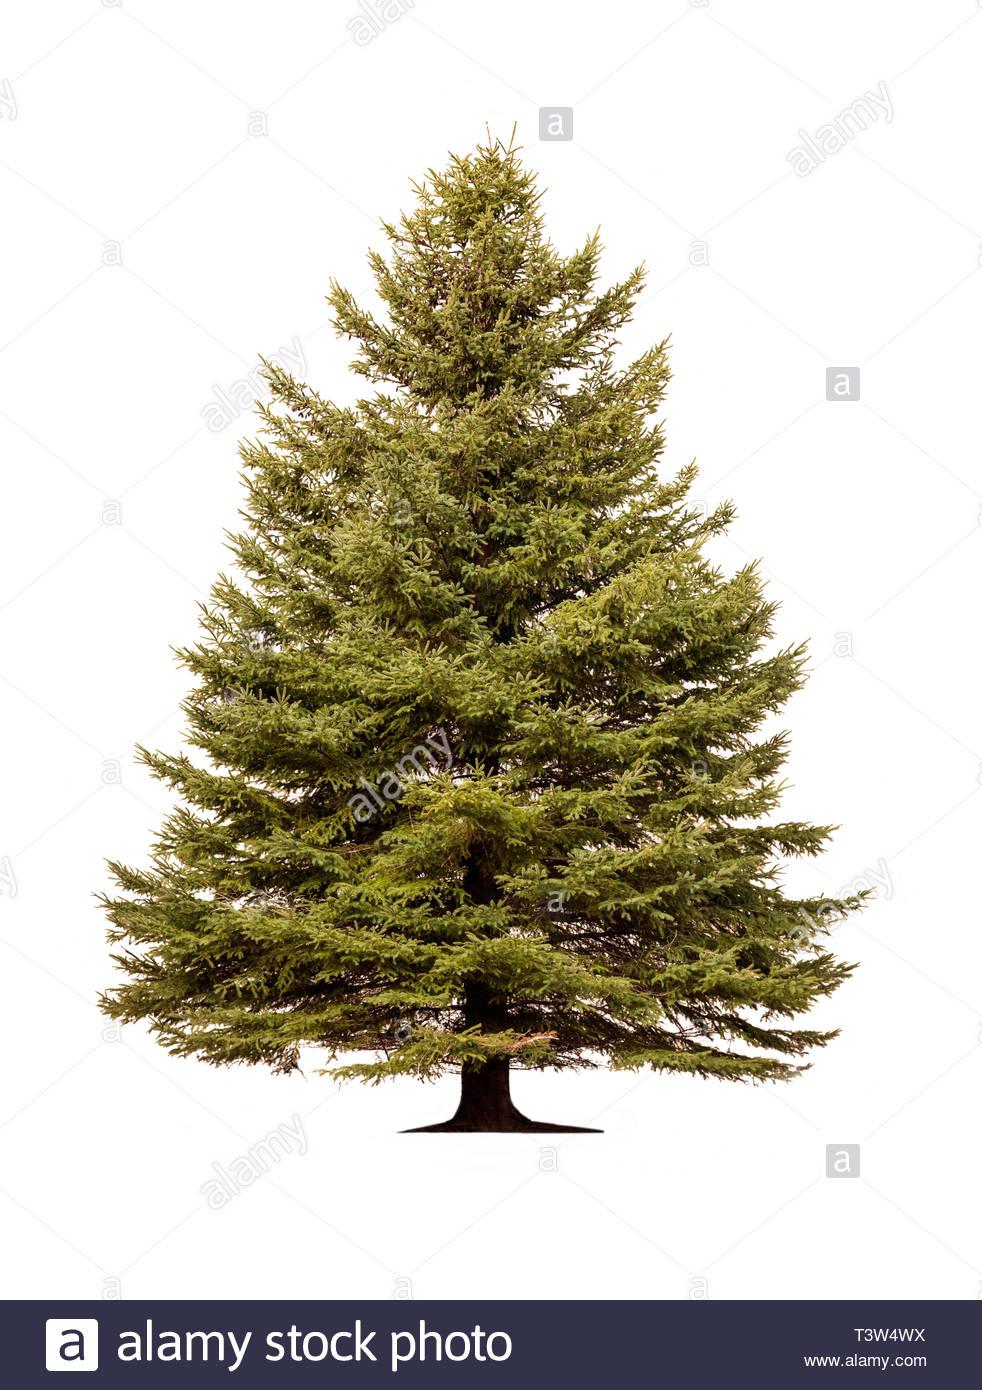 norway-spruce-picea-abies-european-spruc